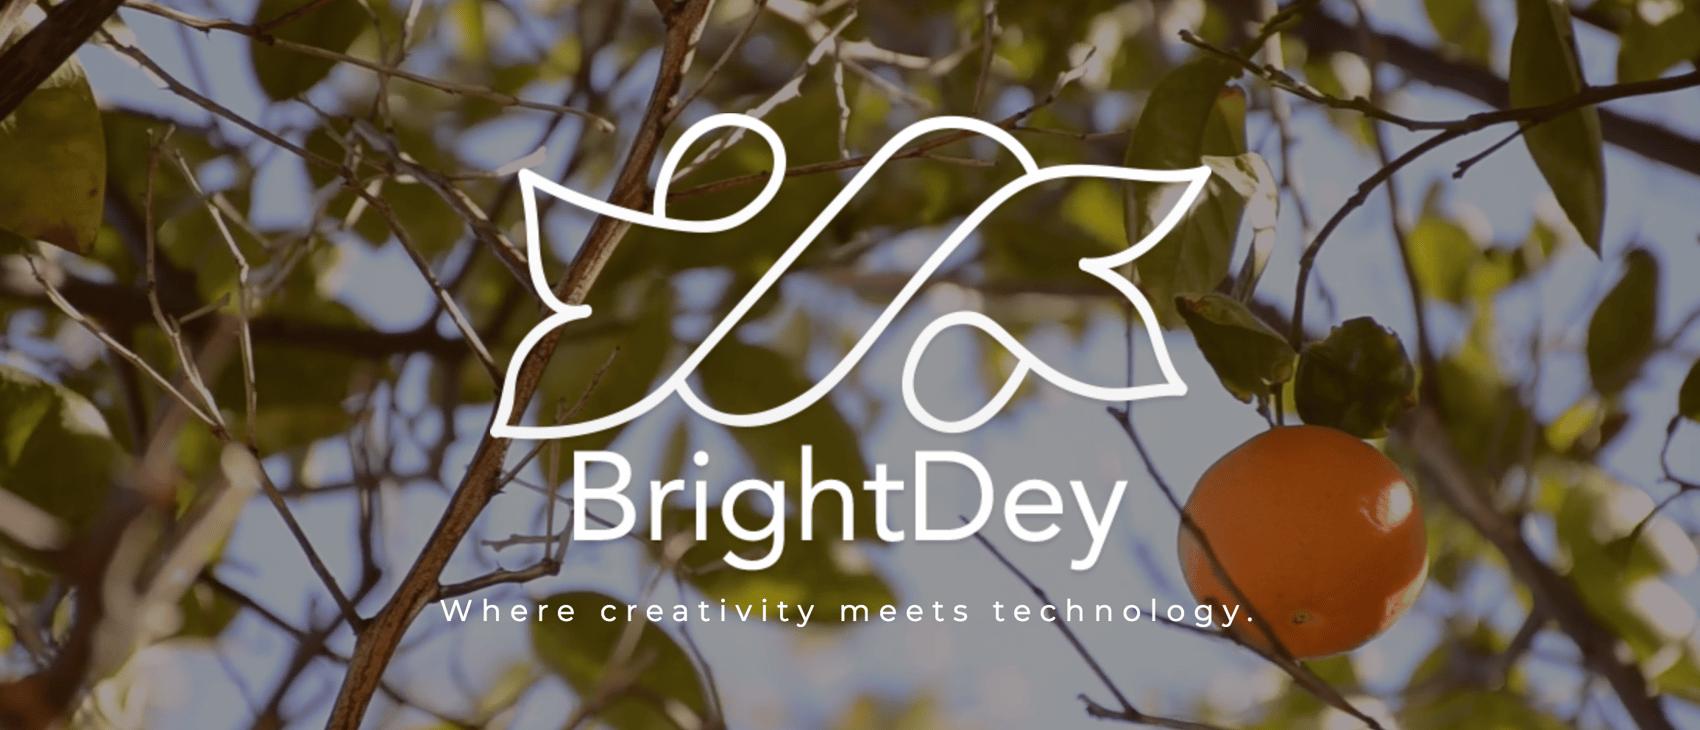 BrightDey Marketing